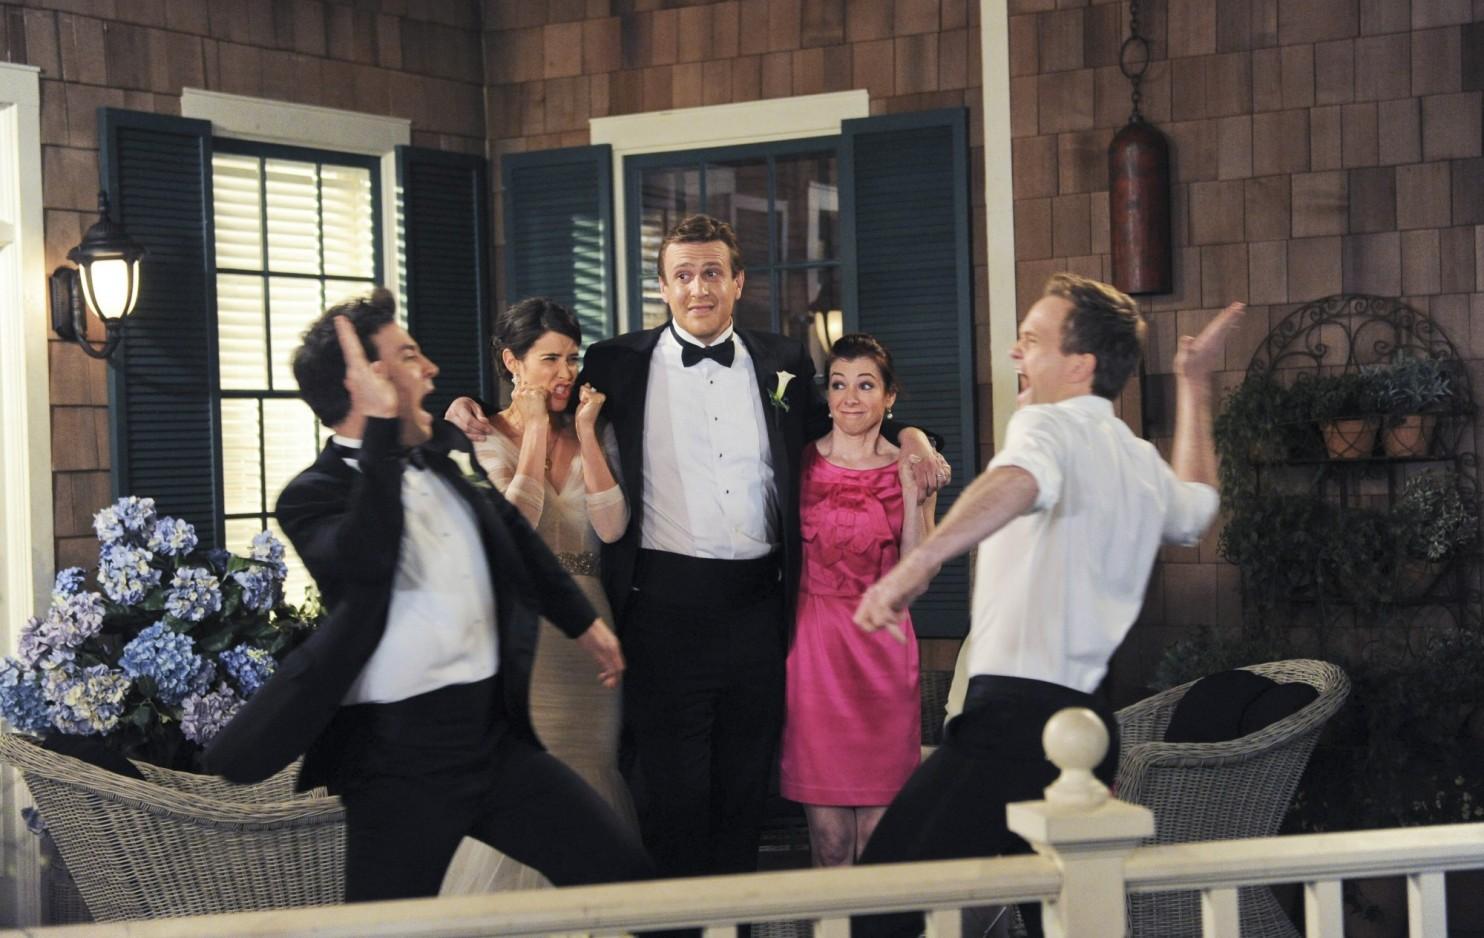 How I Met Your Mother: Jason Segel, Alyson Hannigan, Neil Patrick Harris, Josh Radnor, Cobie Smulders nel finale di serie